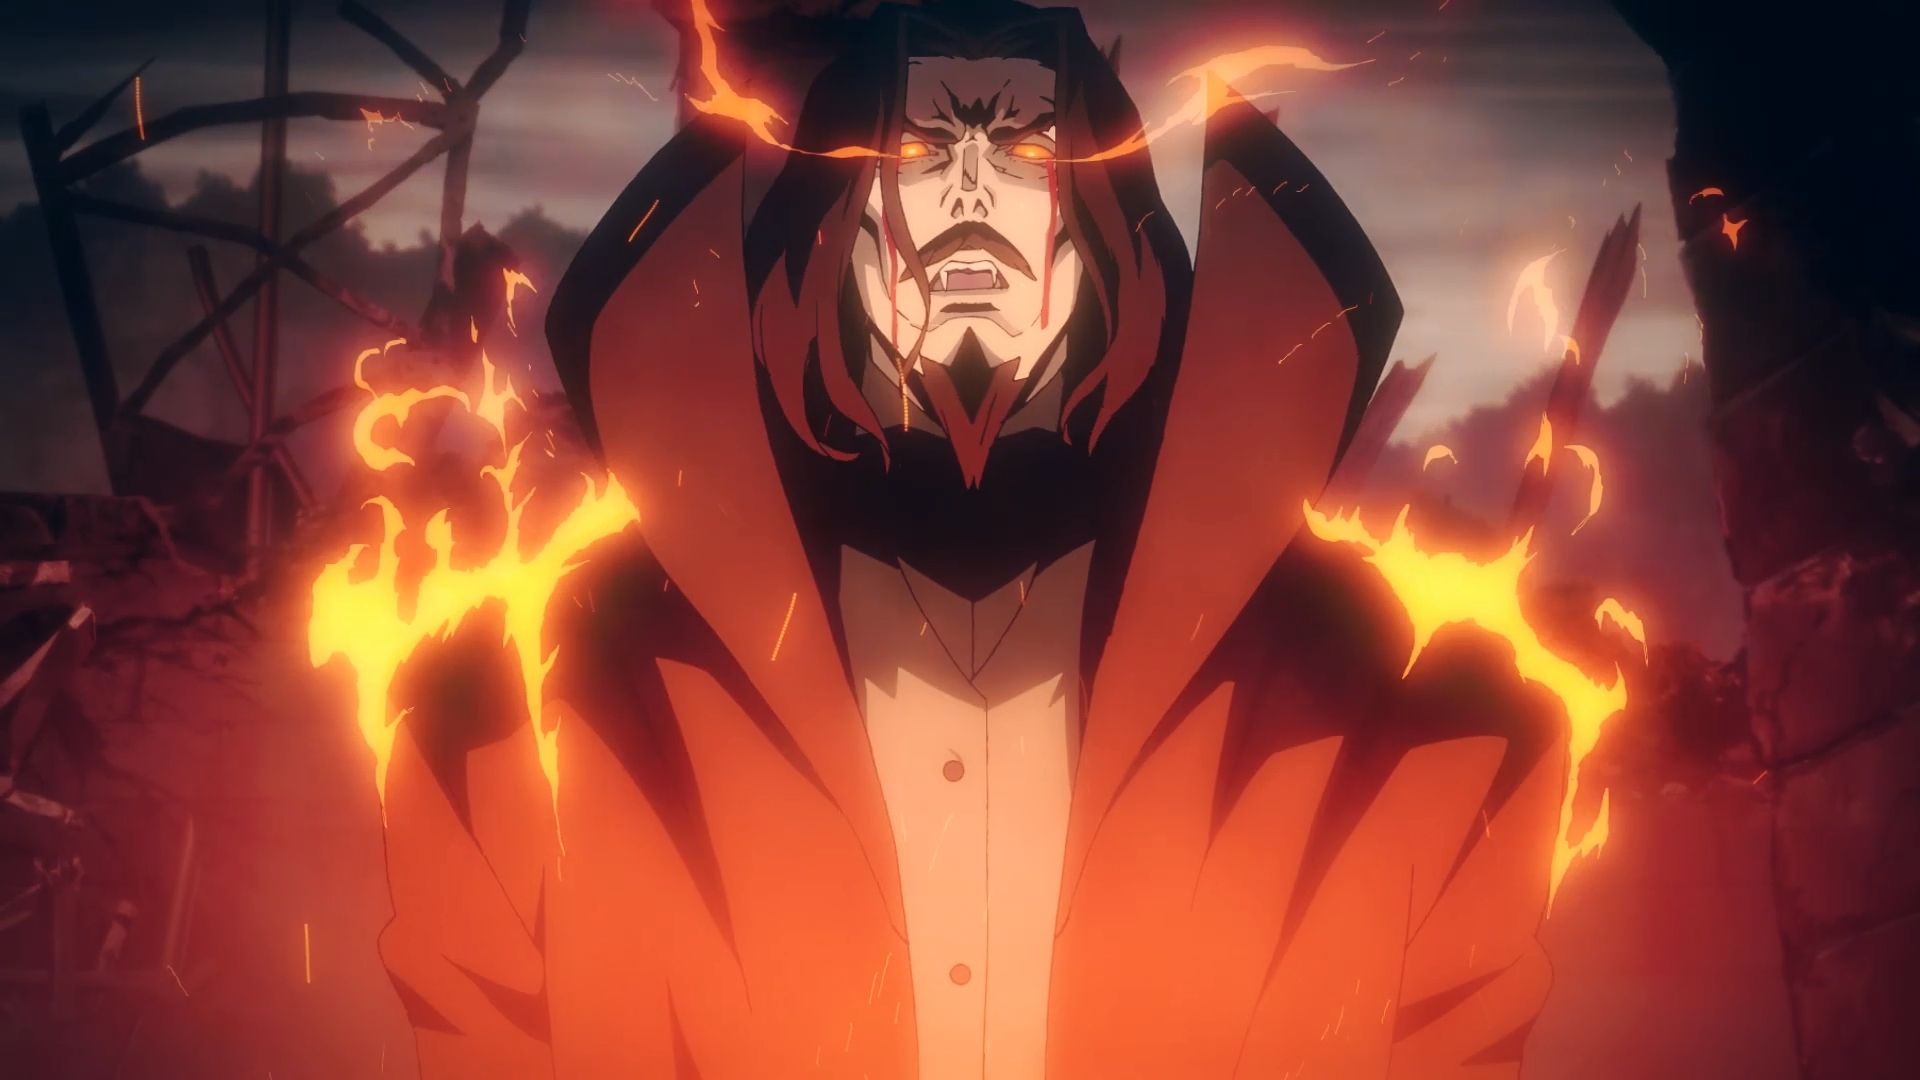 Dracula Castlevania Netflix Gothic Anime Creepy Drawings Anime